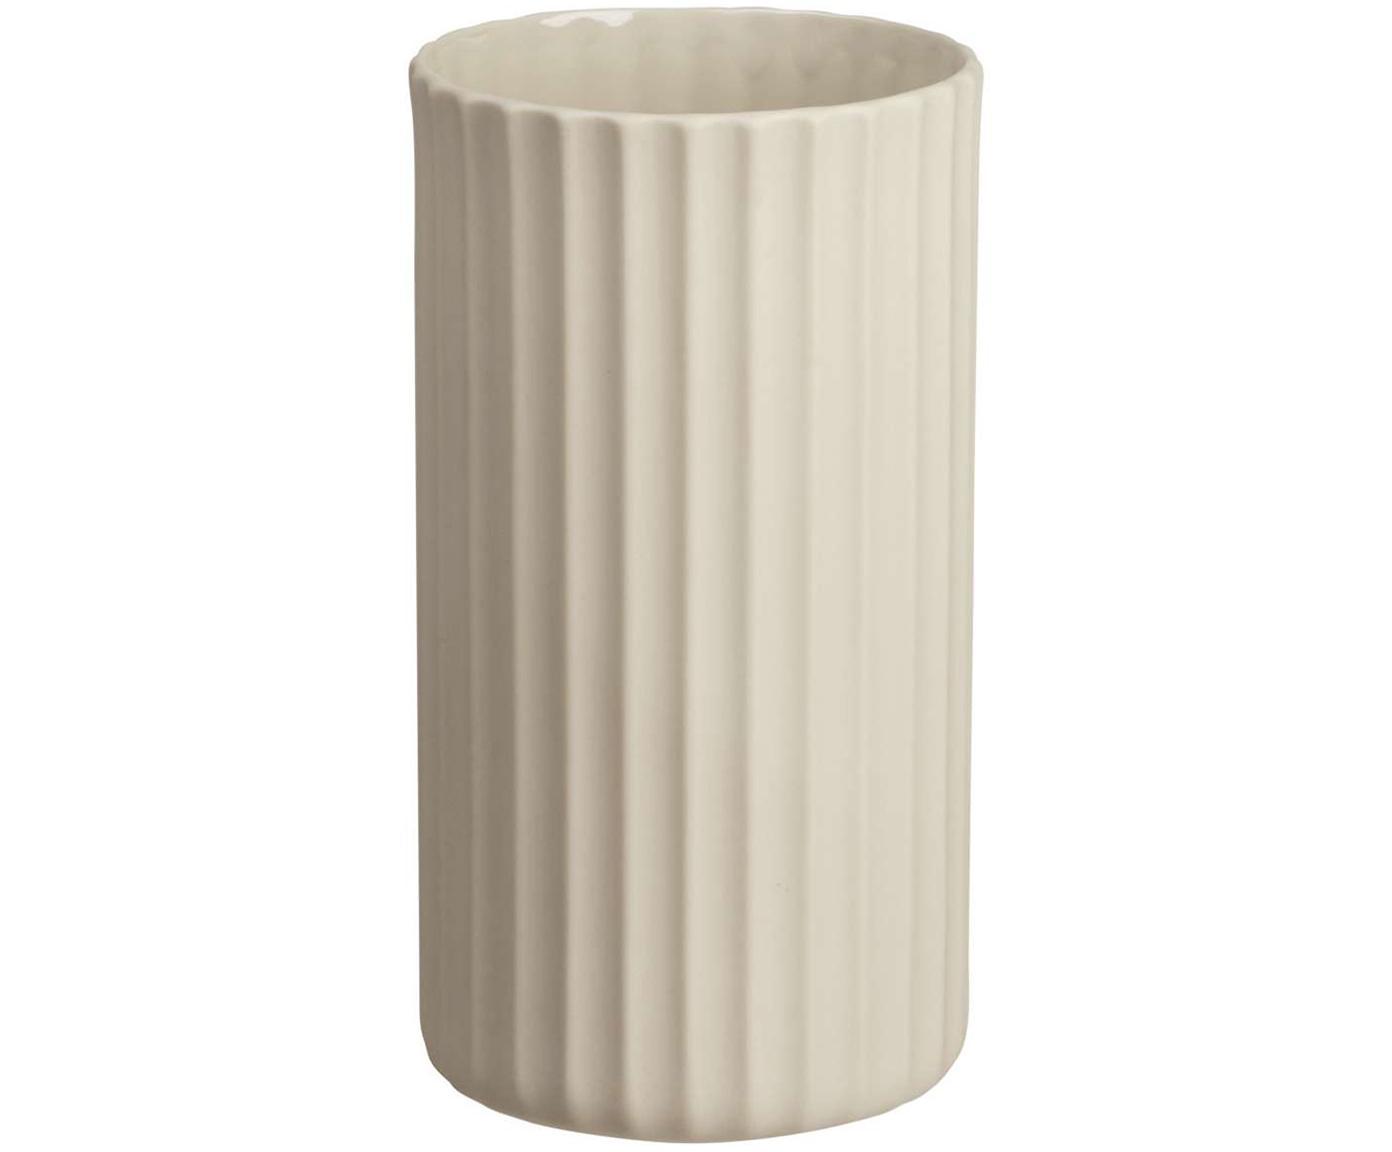 Handgemaakte vaas Yoko van porselein, Porselein, Beige, Ø 9 x H 16 cm